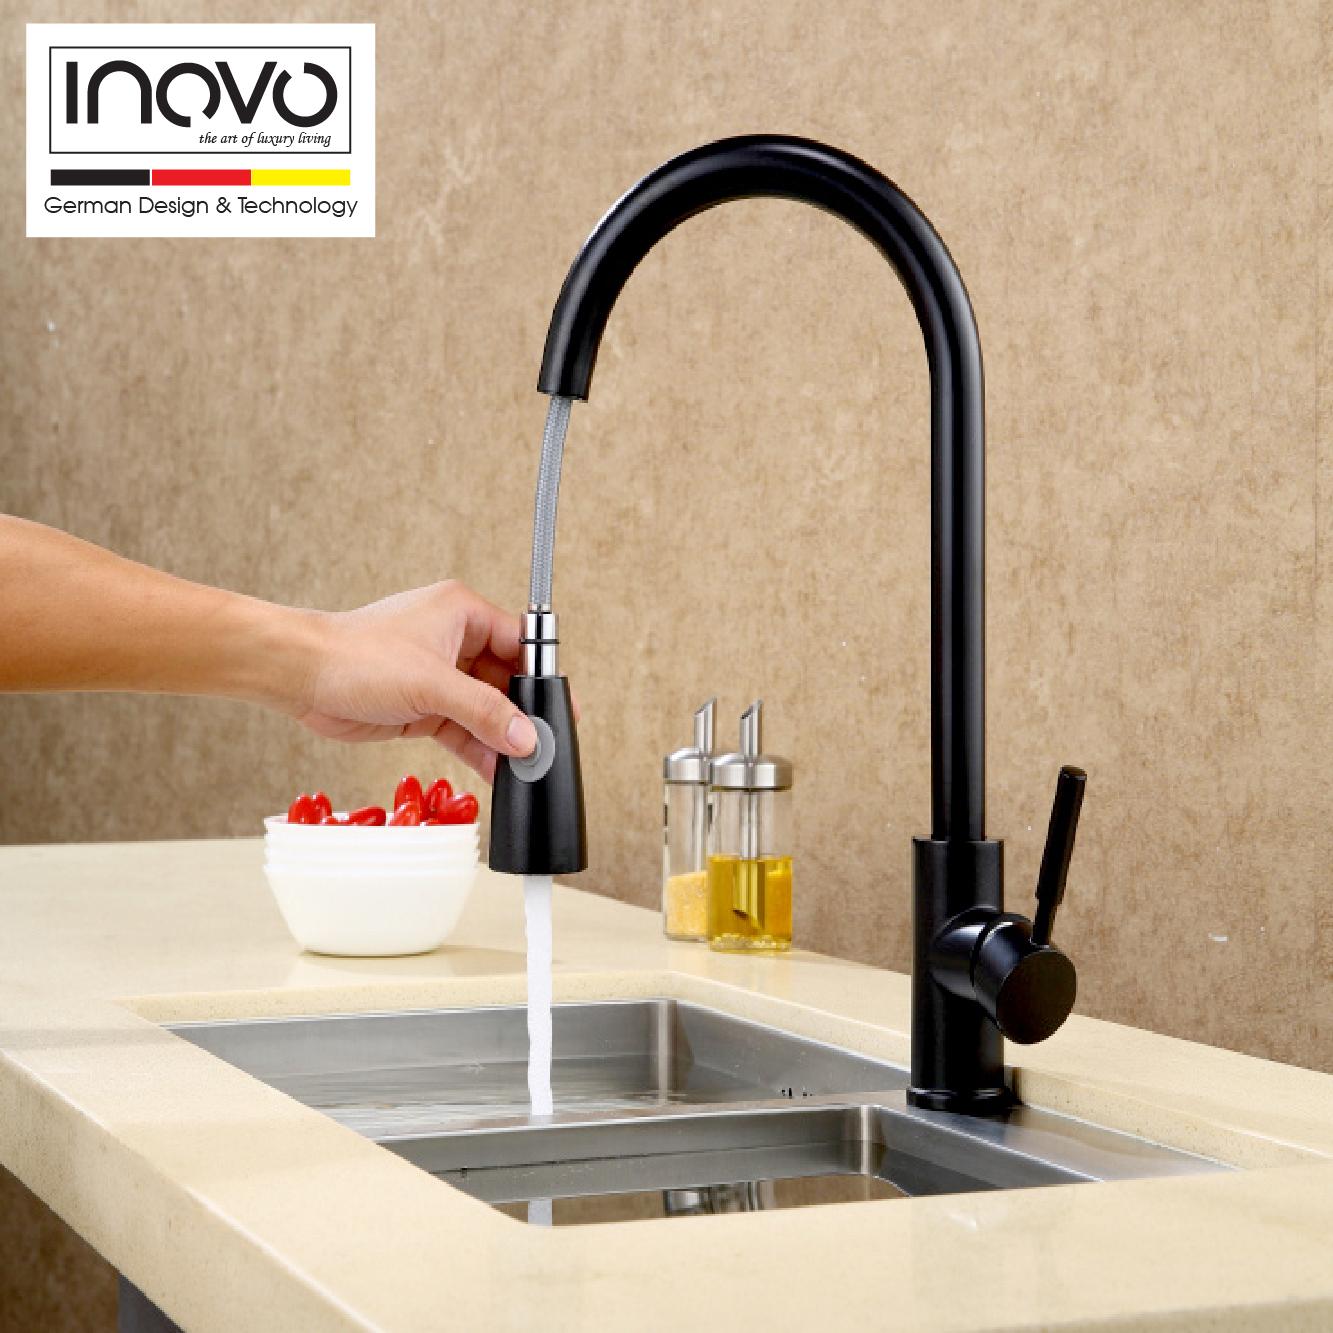 INOVO Cosima Kitchen mixer tap in Full Black - inovo